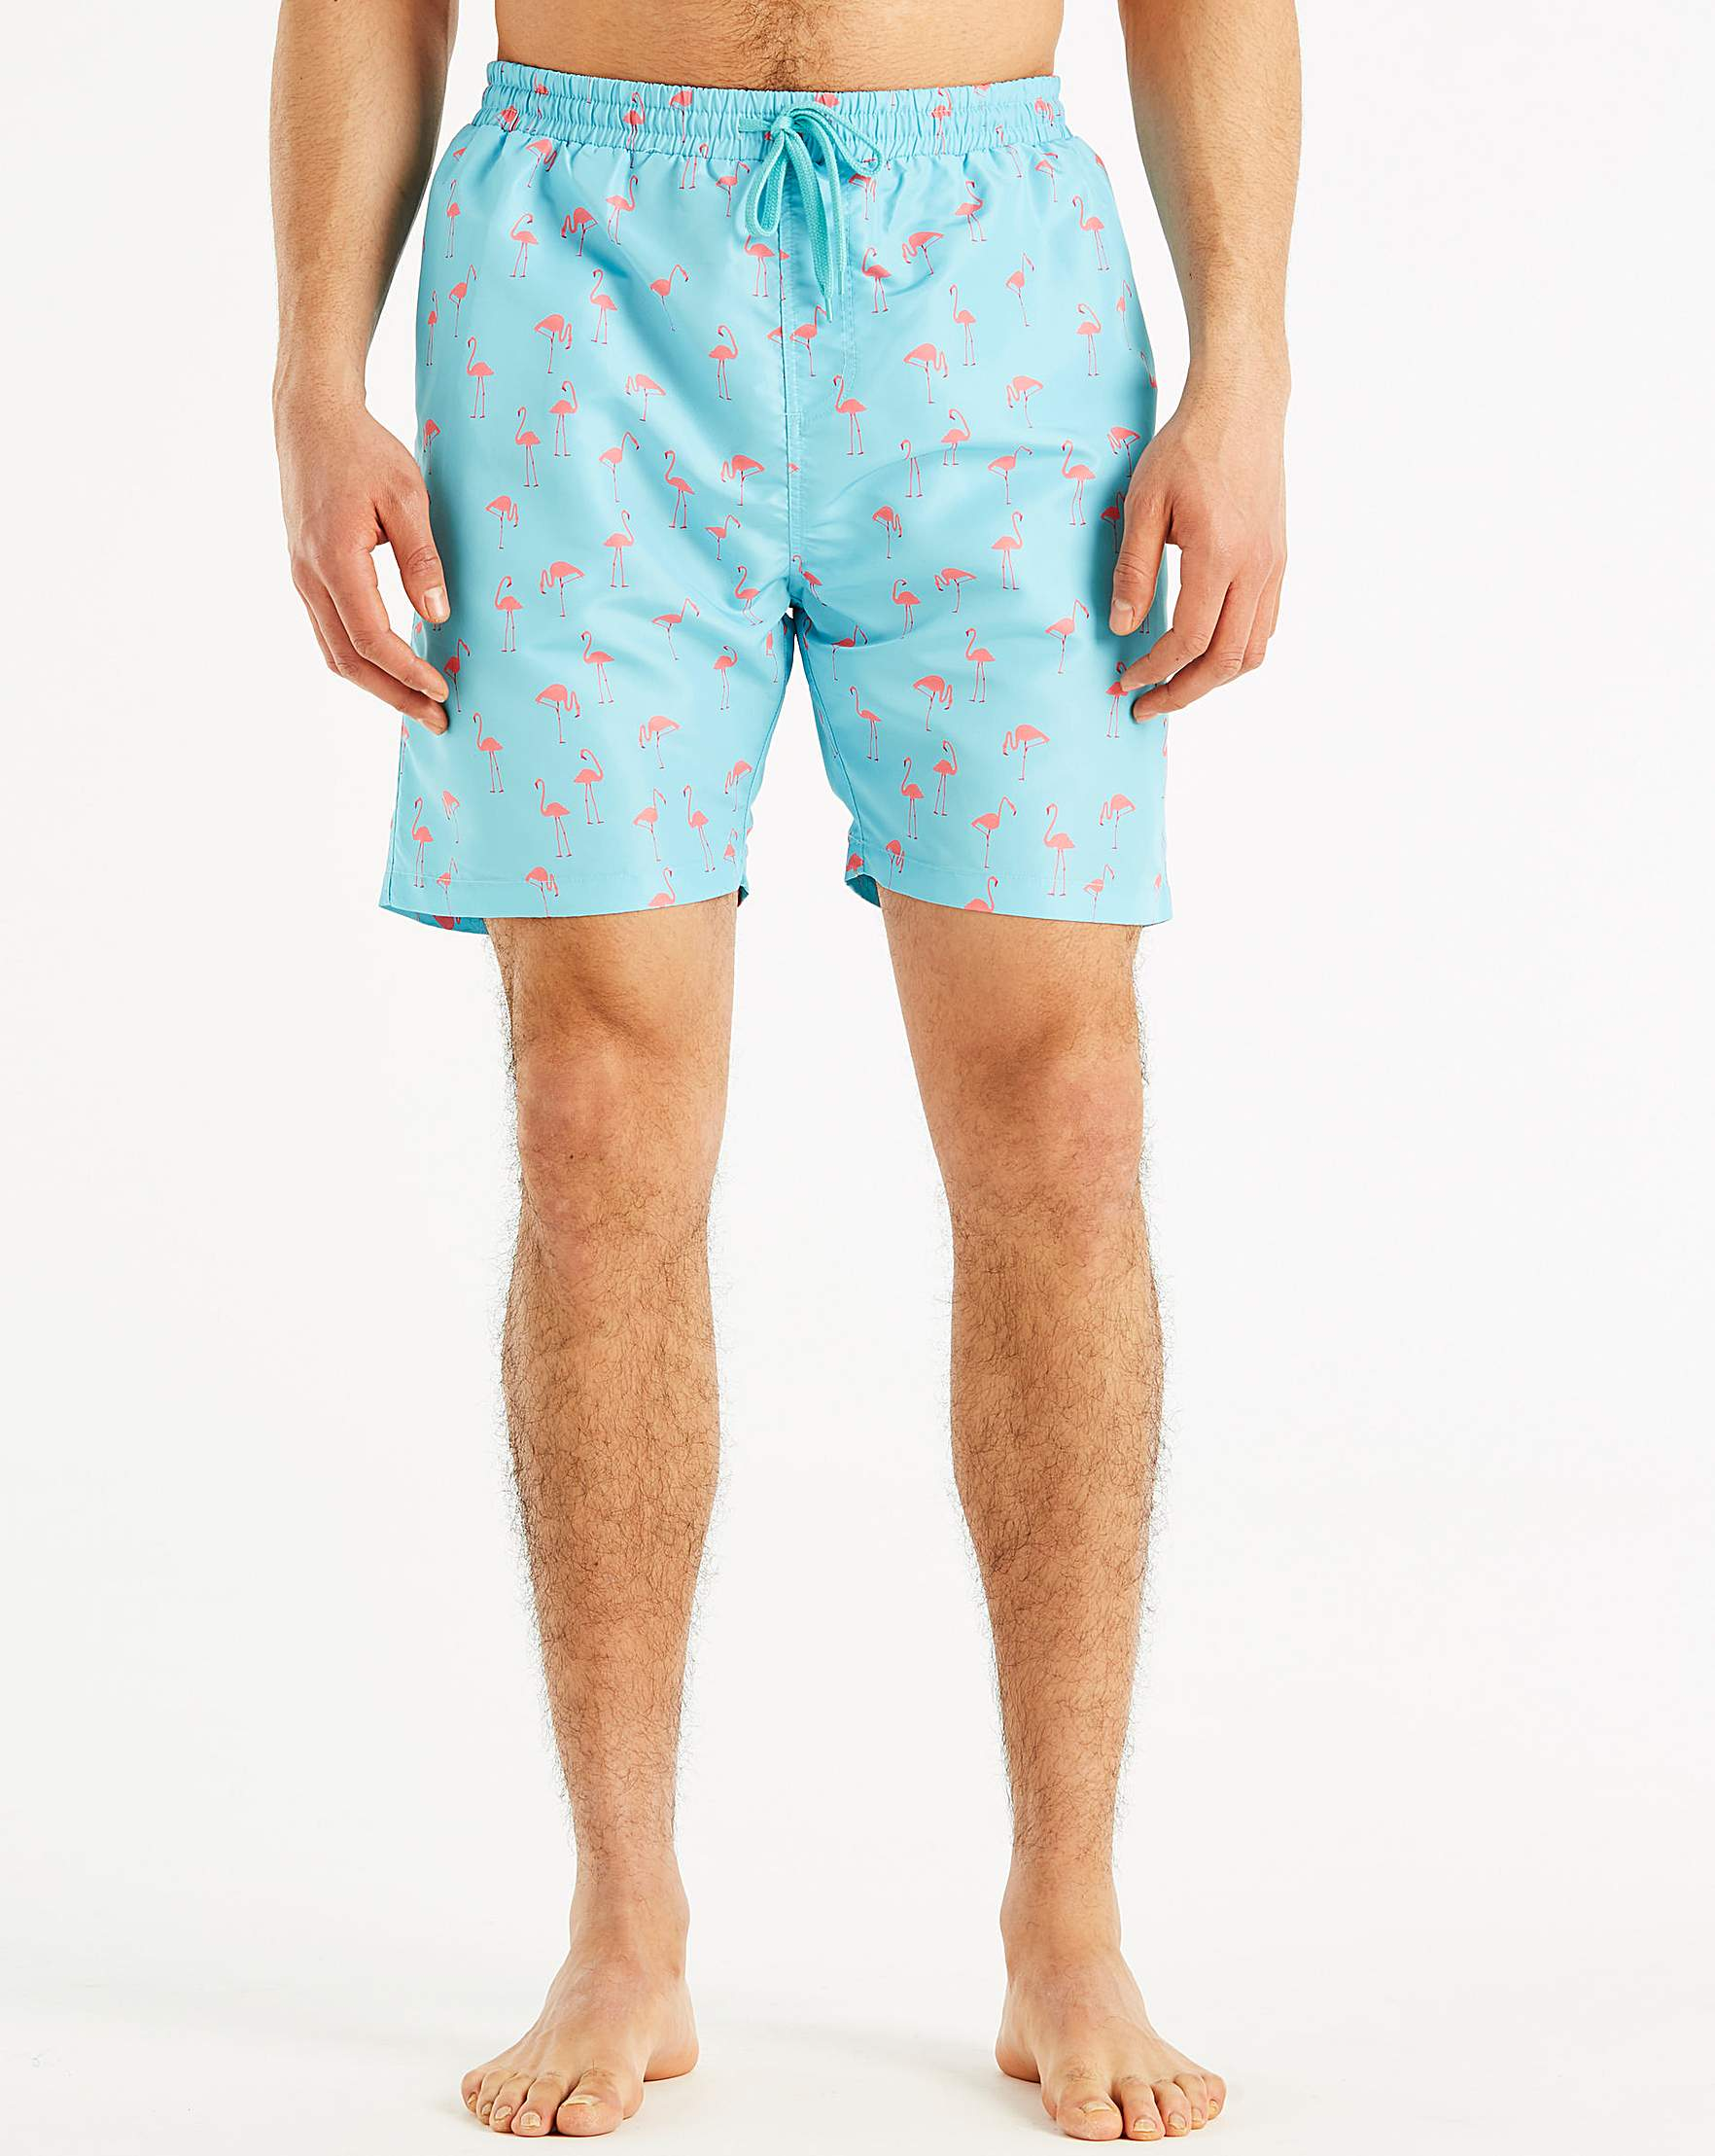 8b077f2c0d9 Jacamo Flamingo Printed Swim Shorts